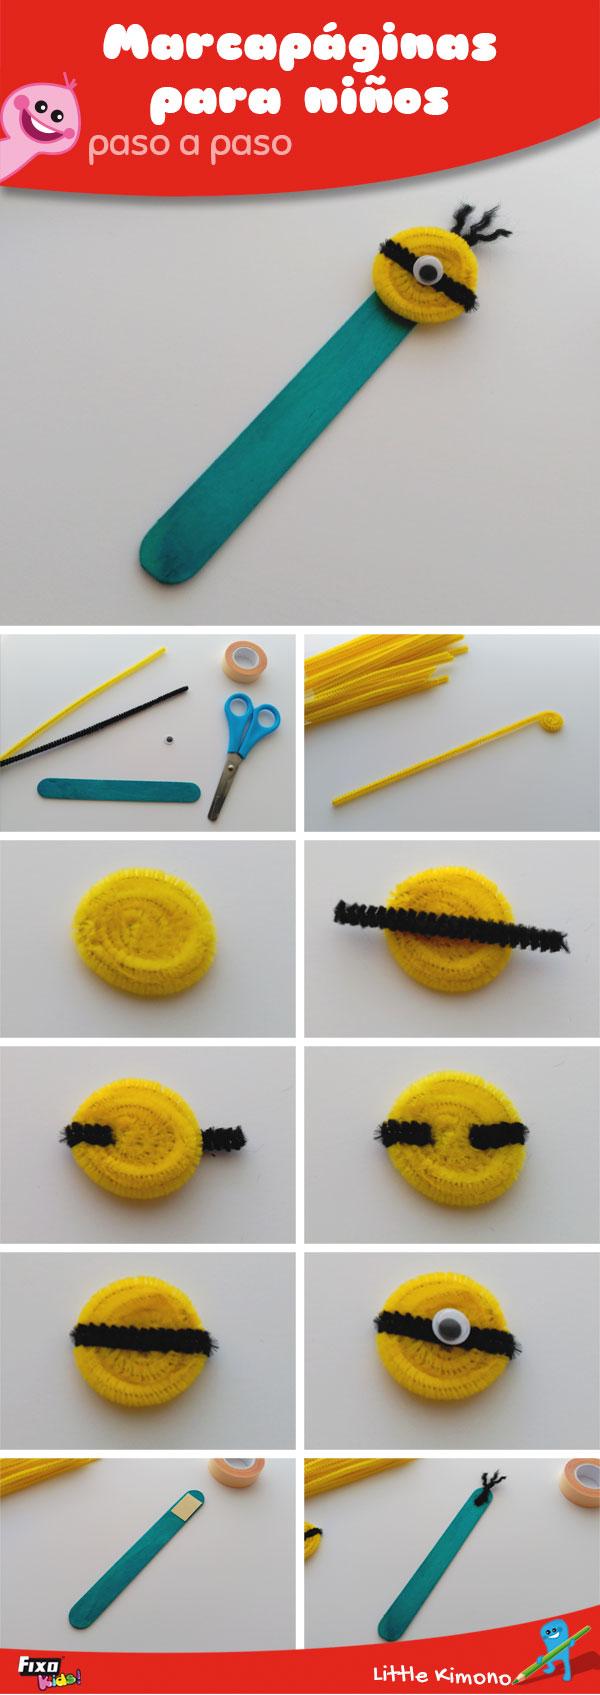 tutorial para hacer marcapáginas minion